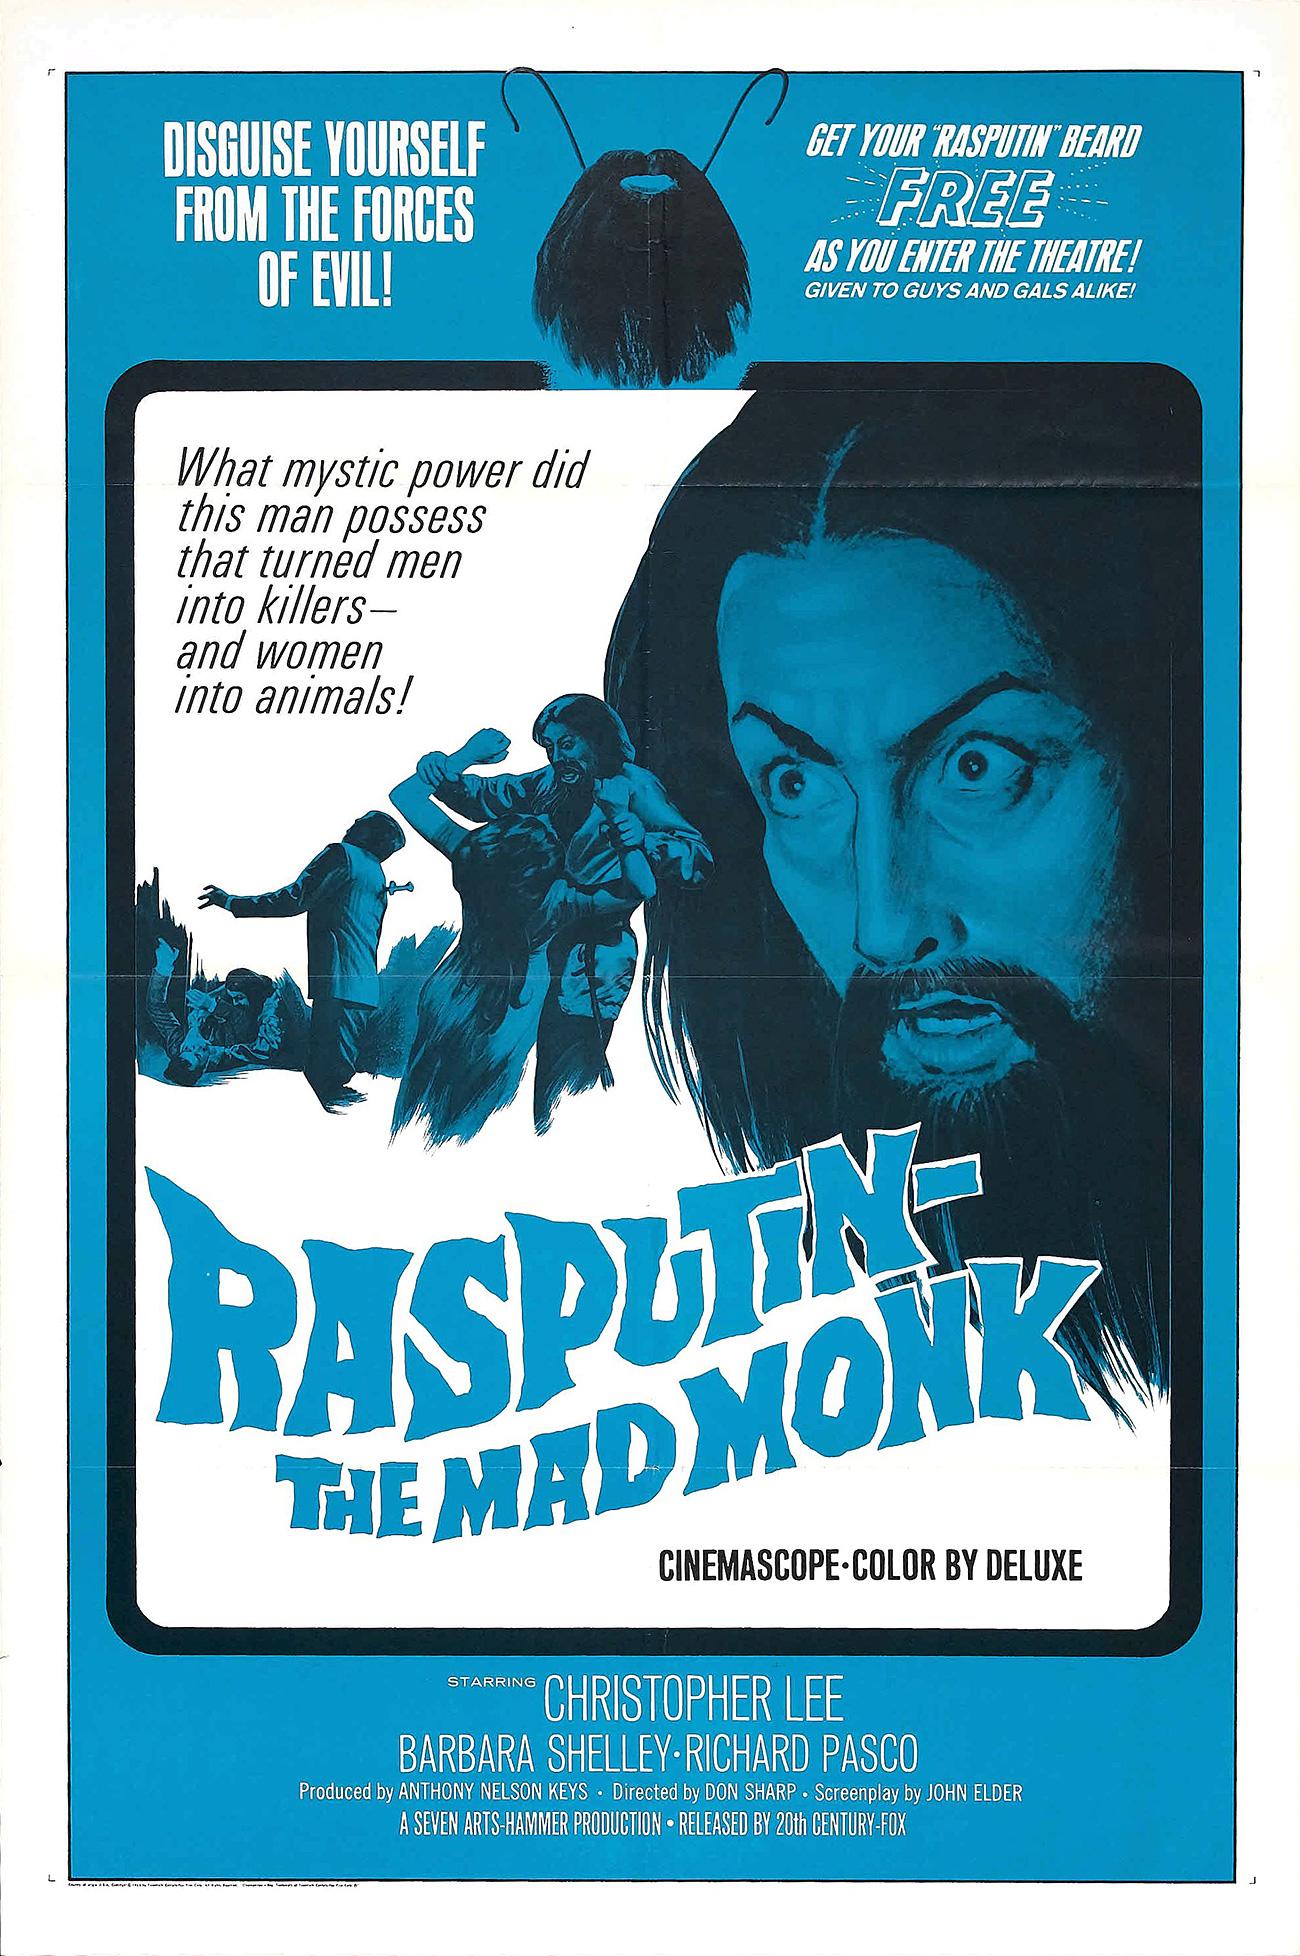 Rasputin - The Mad Monk / Kinopoisk.ru